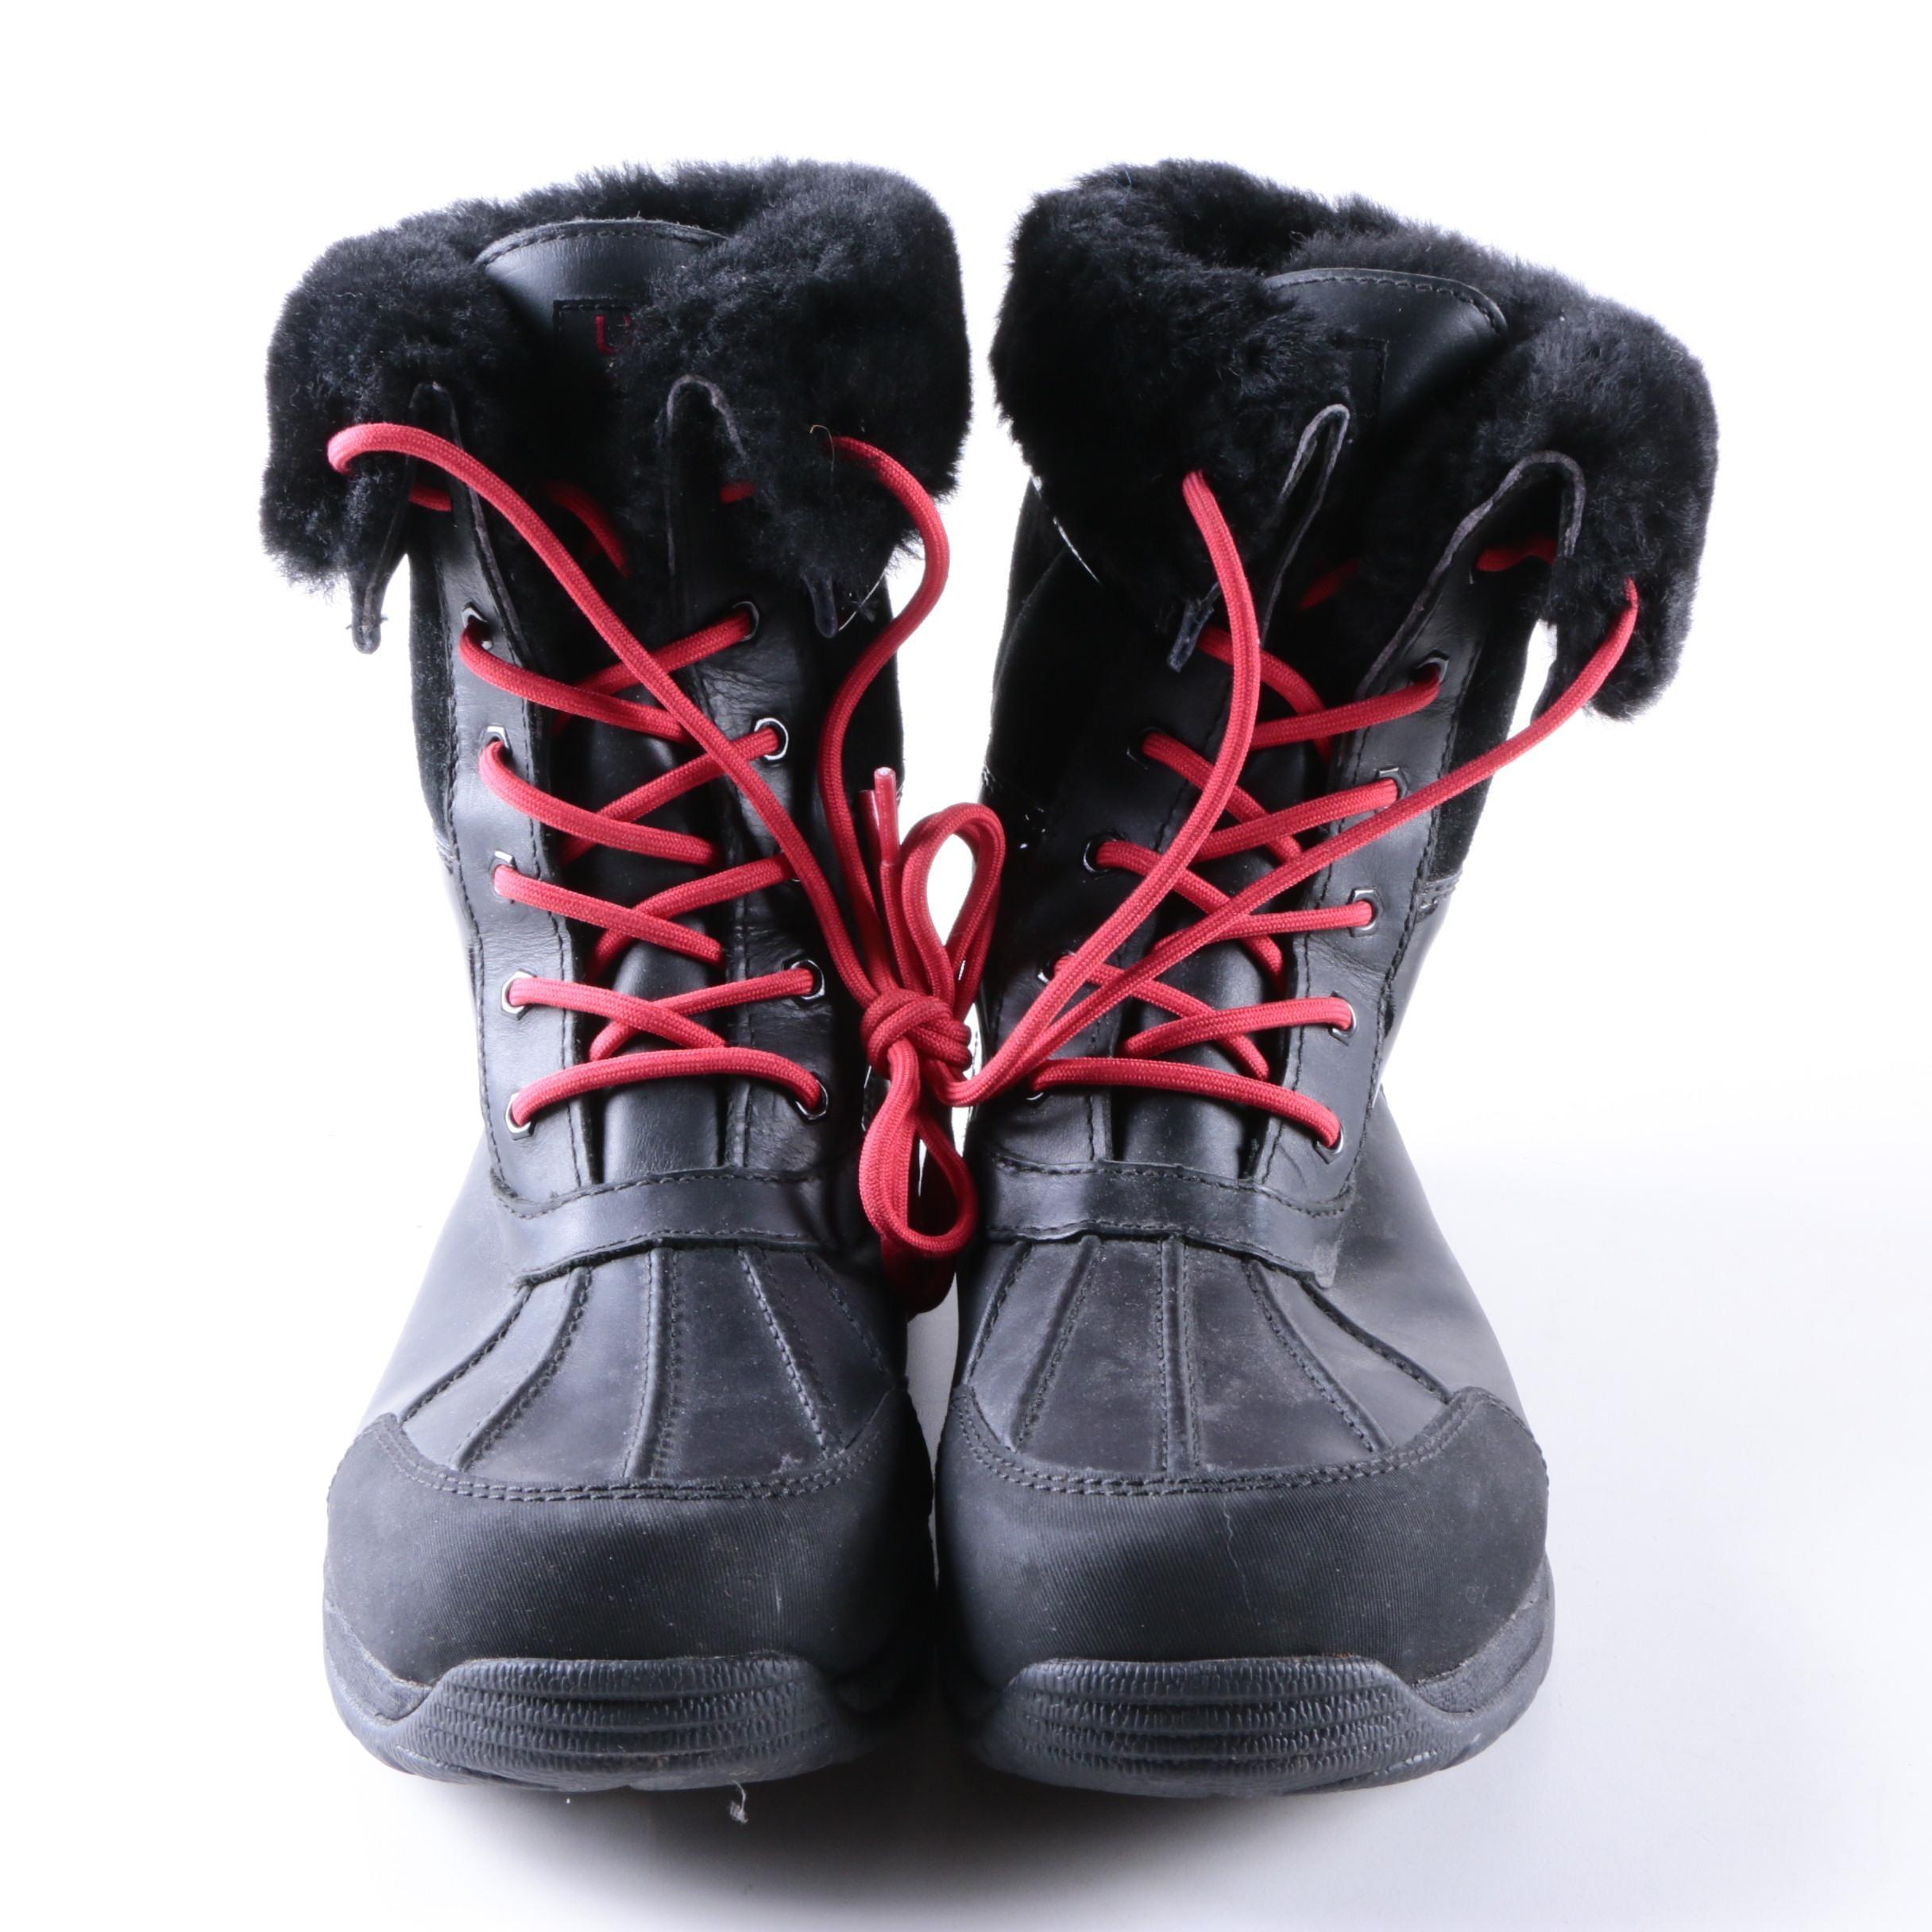 Women's Ugg Adirondack Snow Boots